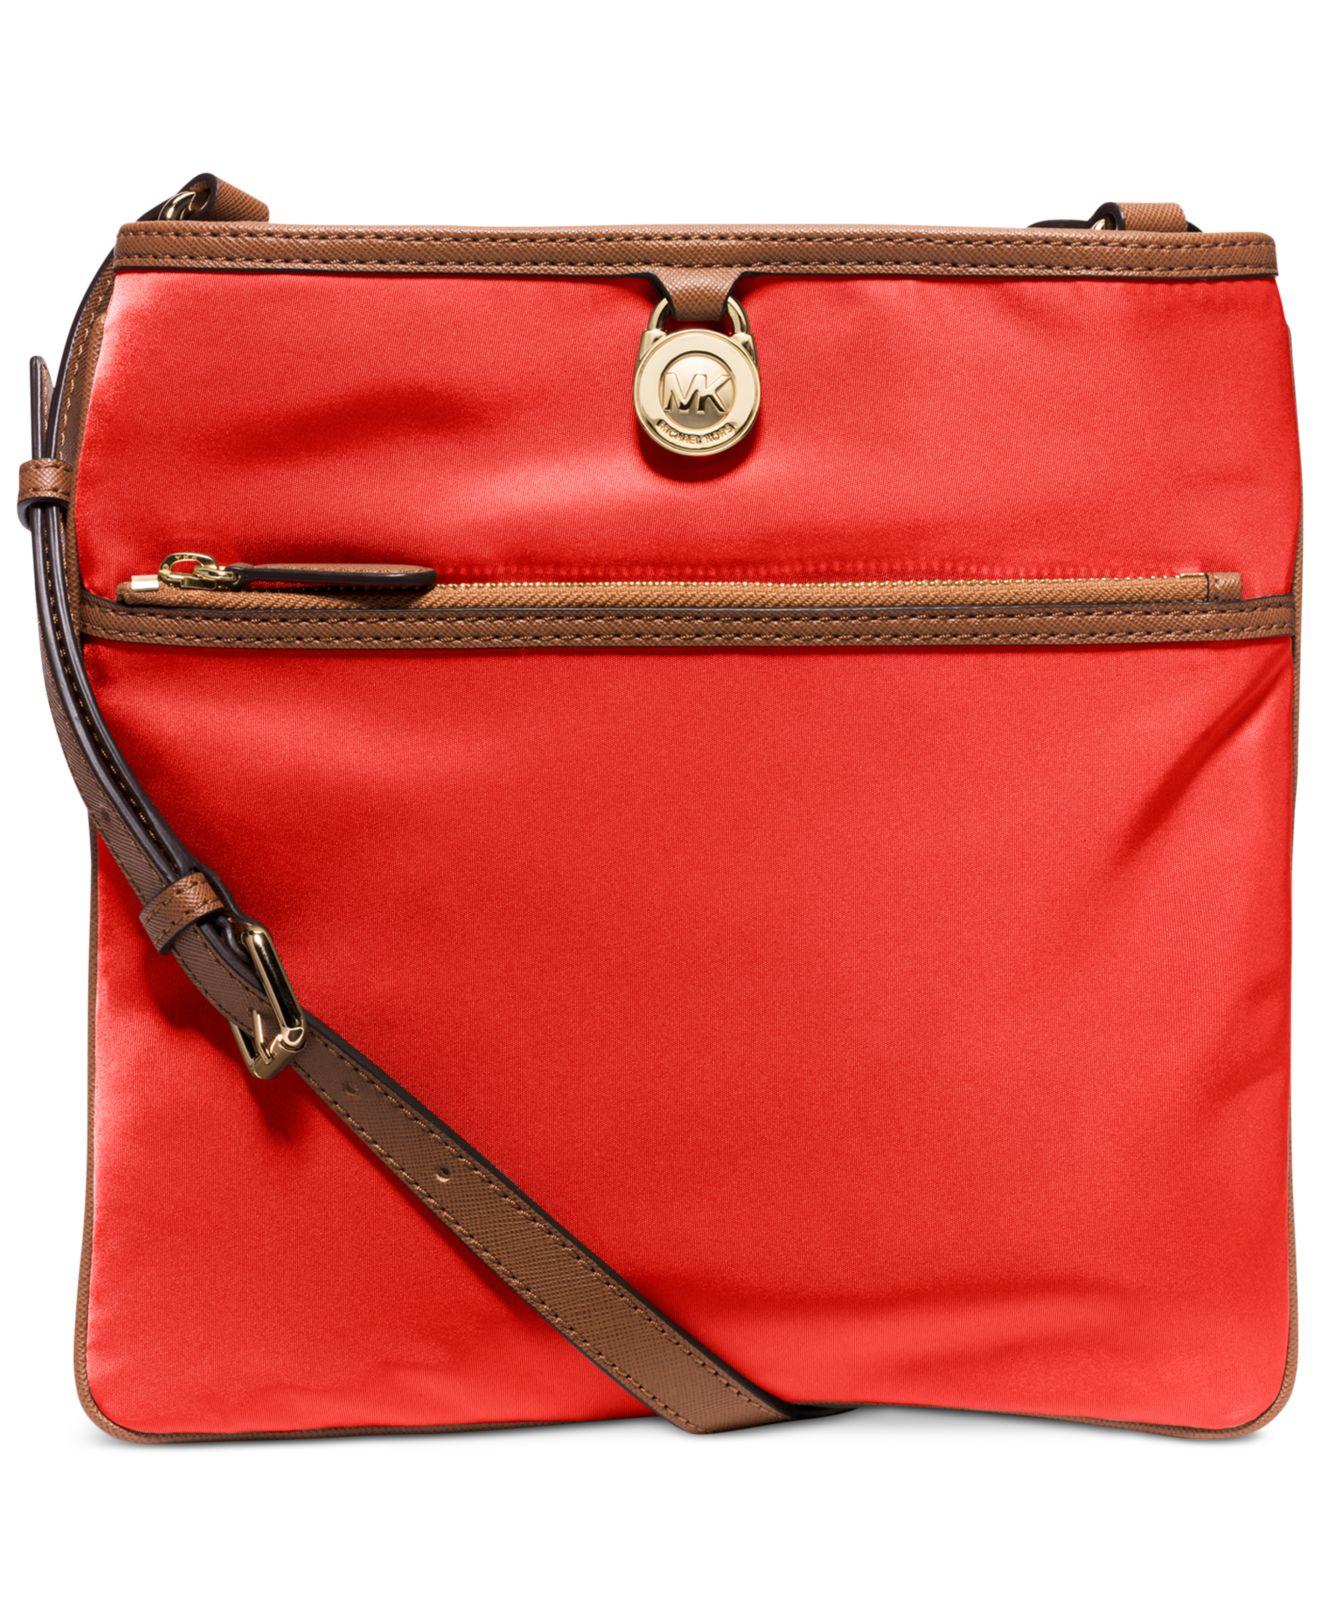 8cfeab439e9b ... low price lyst michael kors michael kempton large pocket crossbody in  red 3598d e51b4